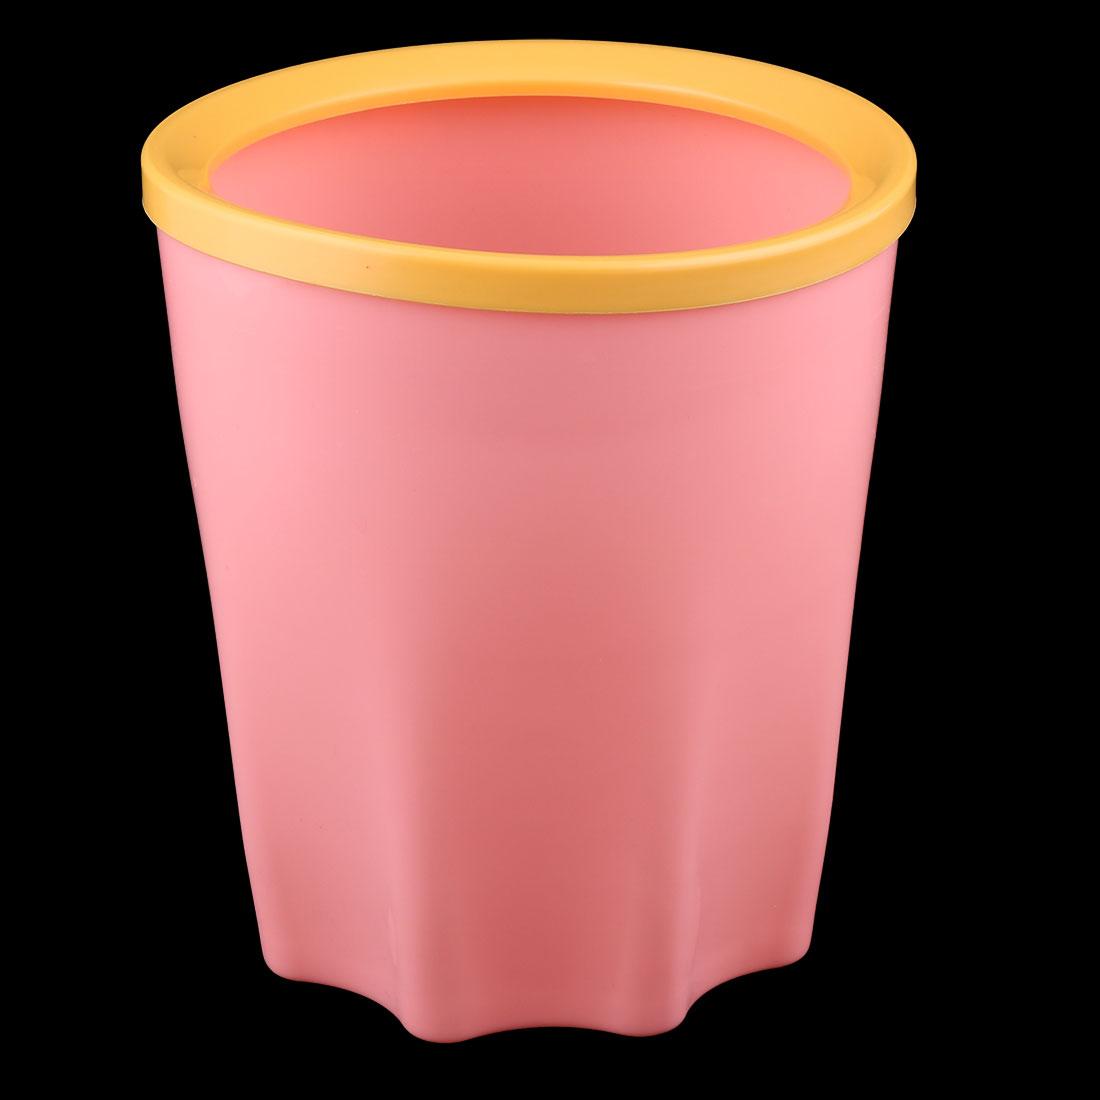 Plastic Table Desktop  Waste Rubbish Bin Garbage Trash Can Pink 17 x 15cm - image 2 of 4